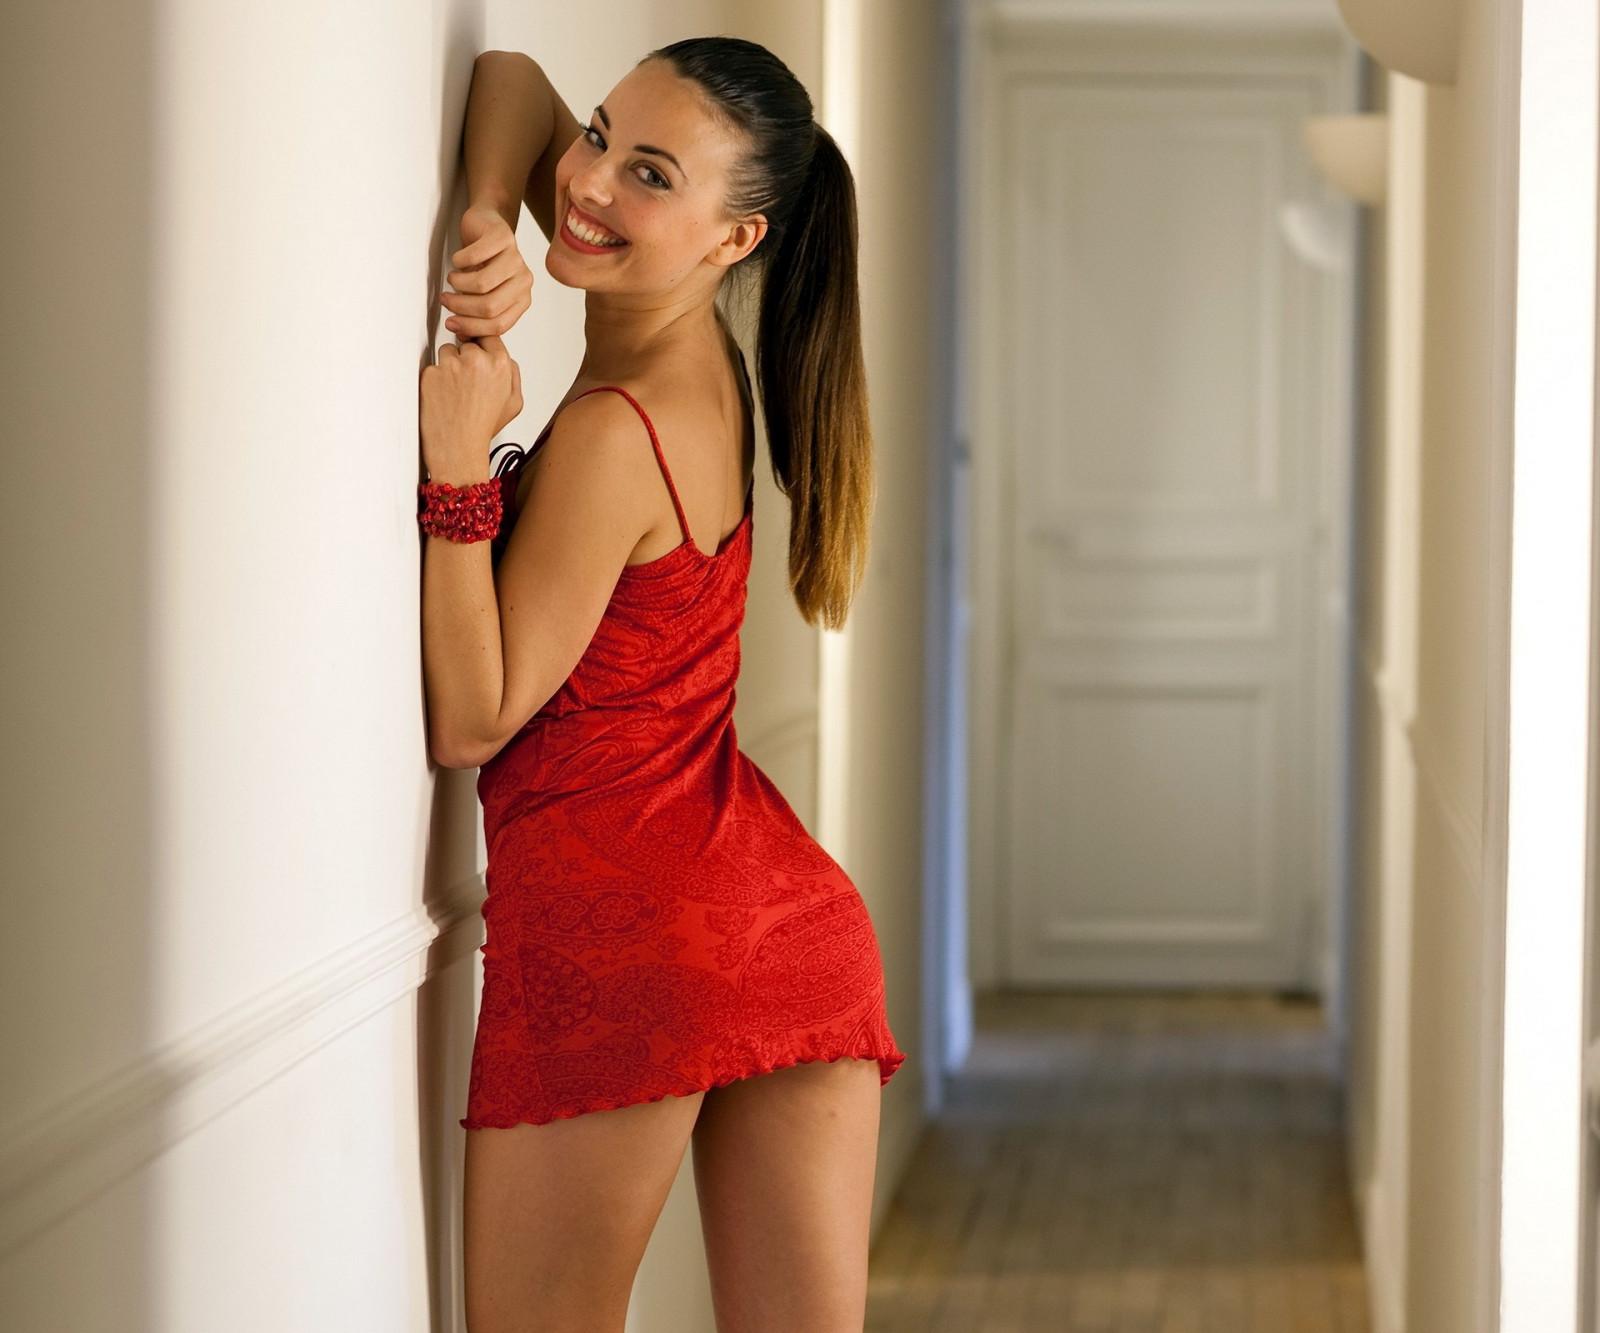 Wallpaper  Women, Model, Brunette, Red Dress, Fashion -4803